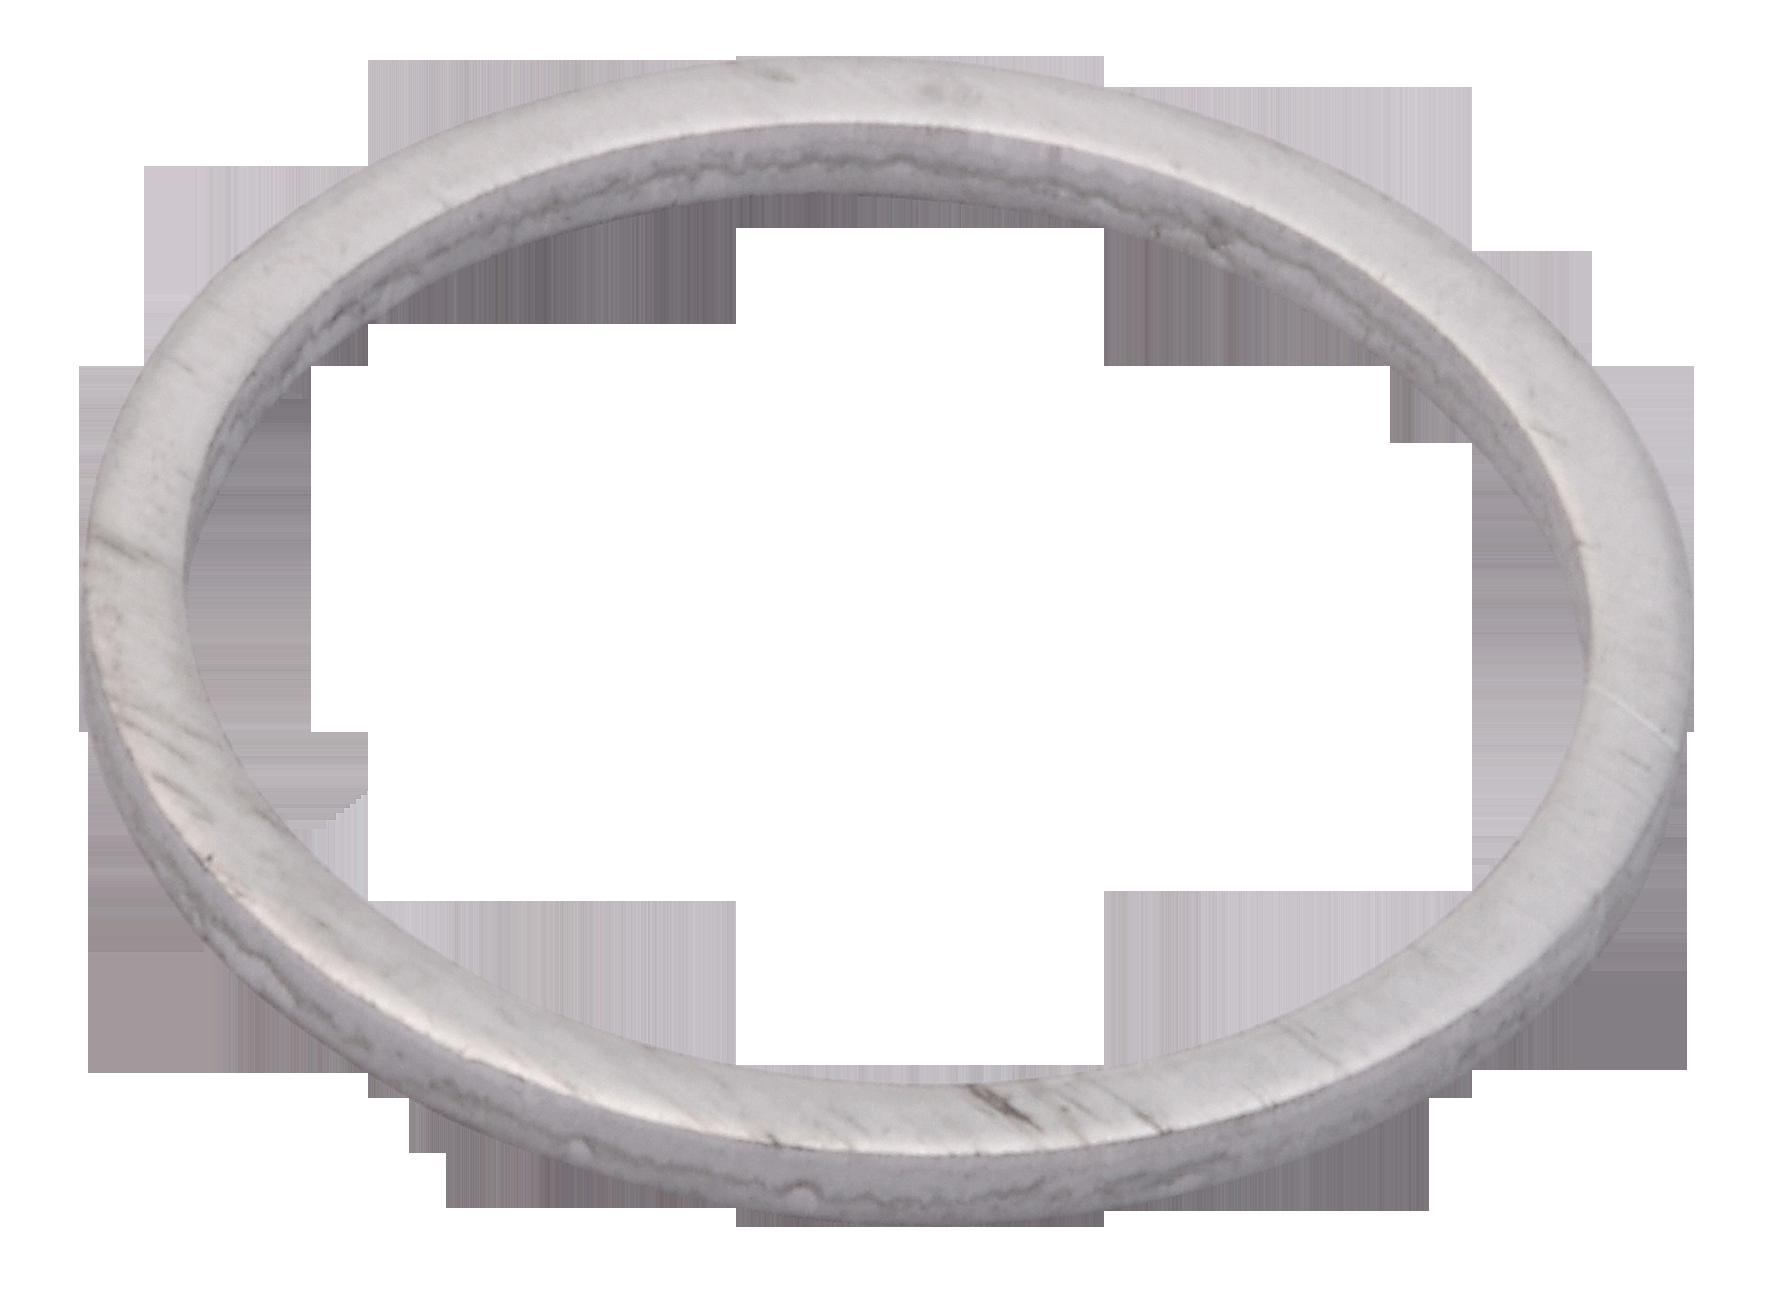 03026L SW-Stahl Aluminium Dicke/Stärke: 1.5mm, Ø: 24mm, Innendurchmesser: 20mm Ölablaßschraube Dichtung 03026L günstig kaufen